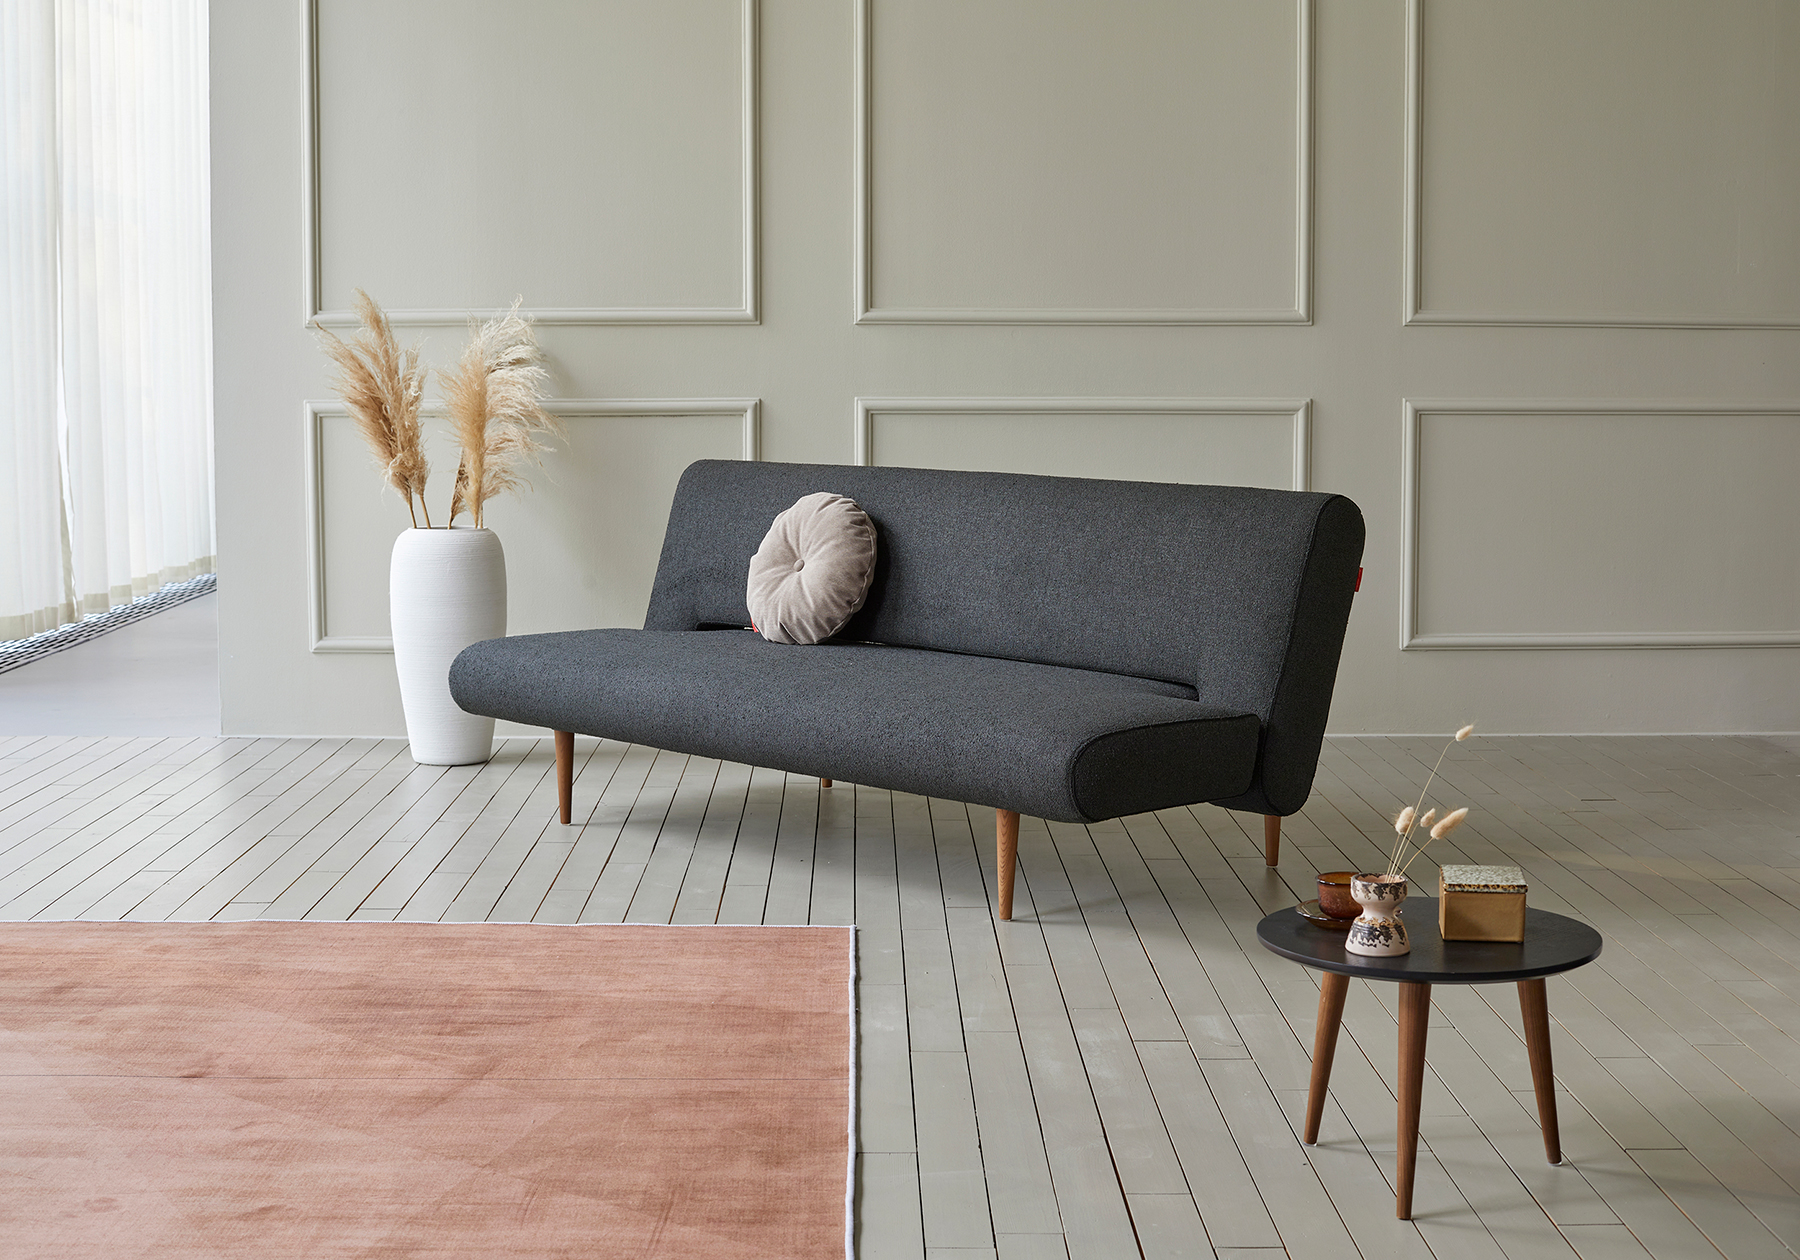 media/image/Unfurl-Sofa-Bed-534-e4-web.jpg